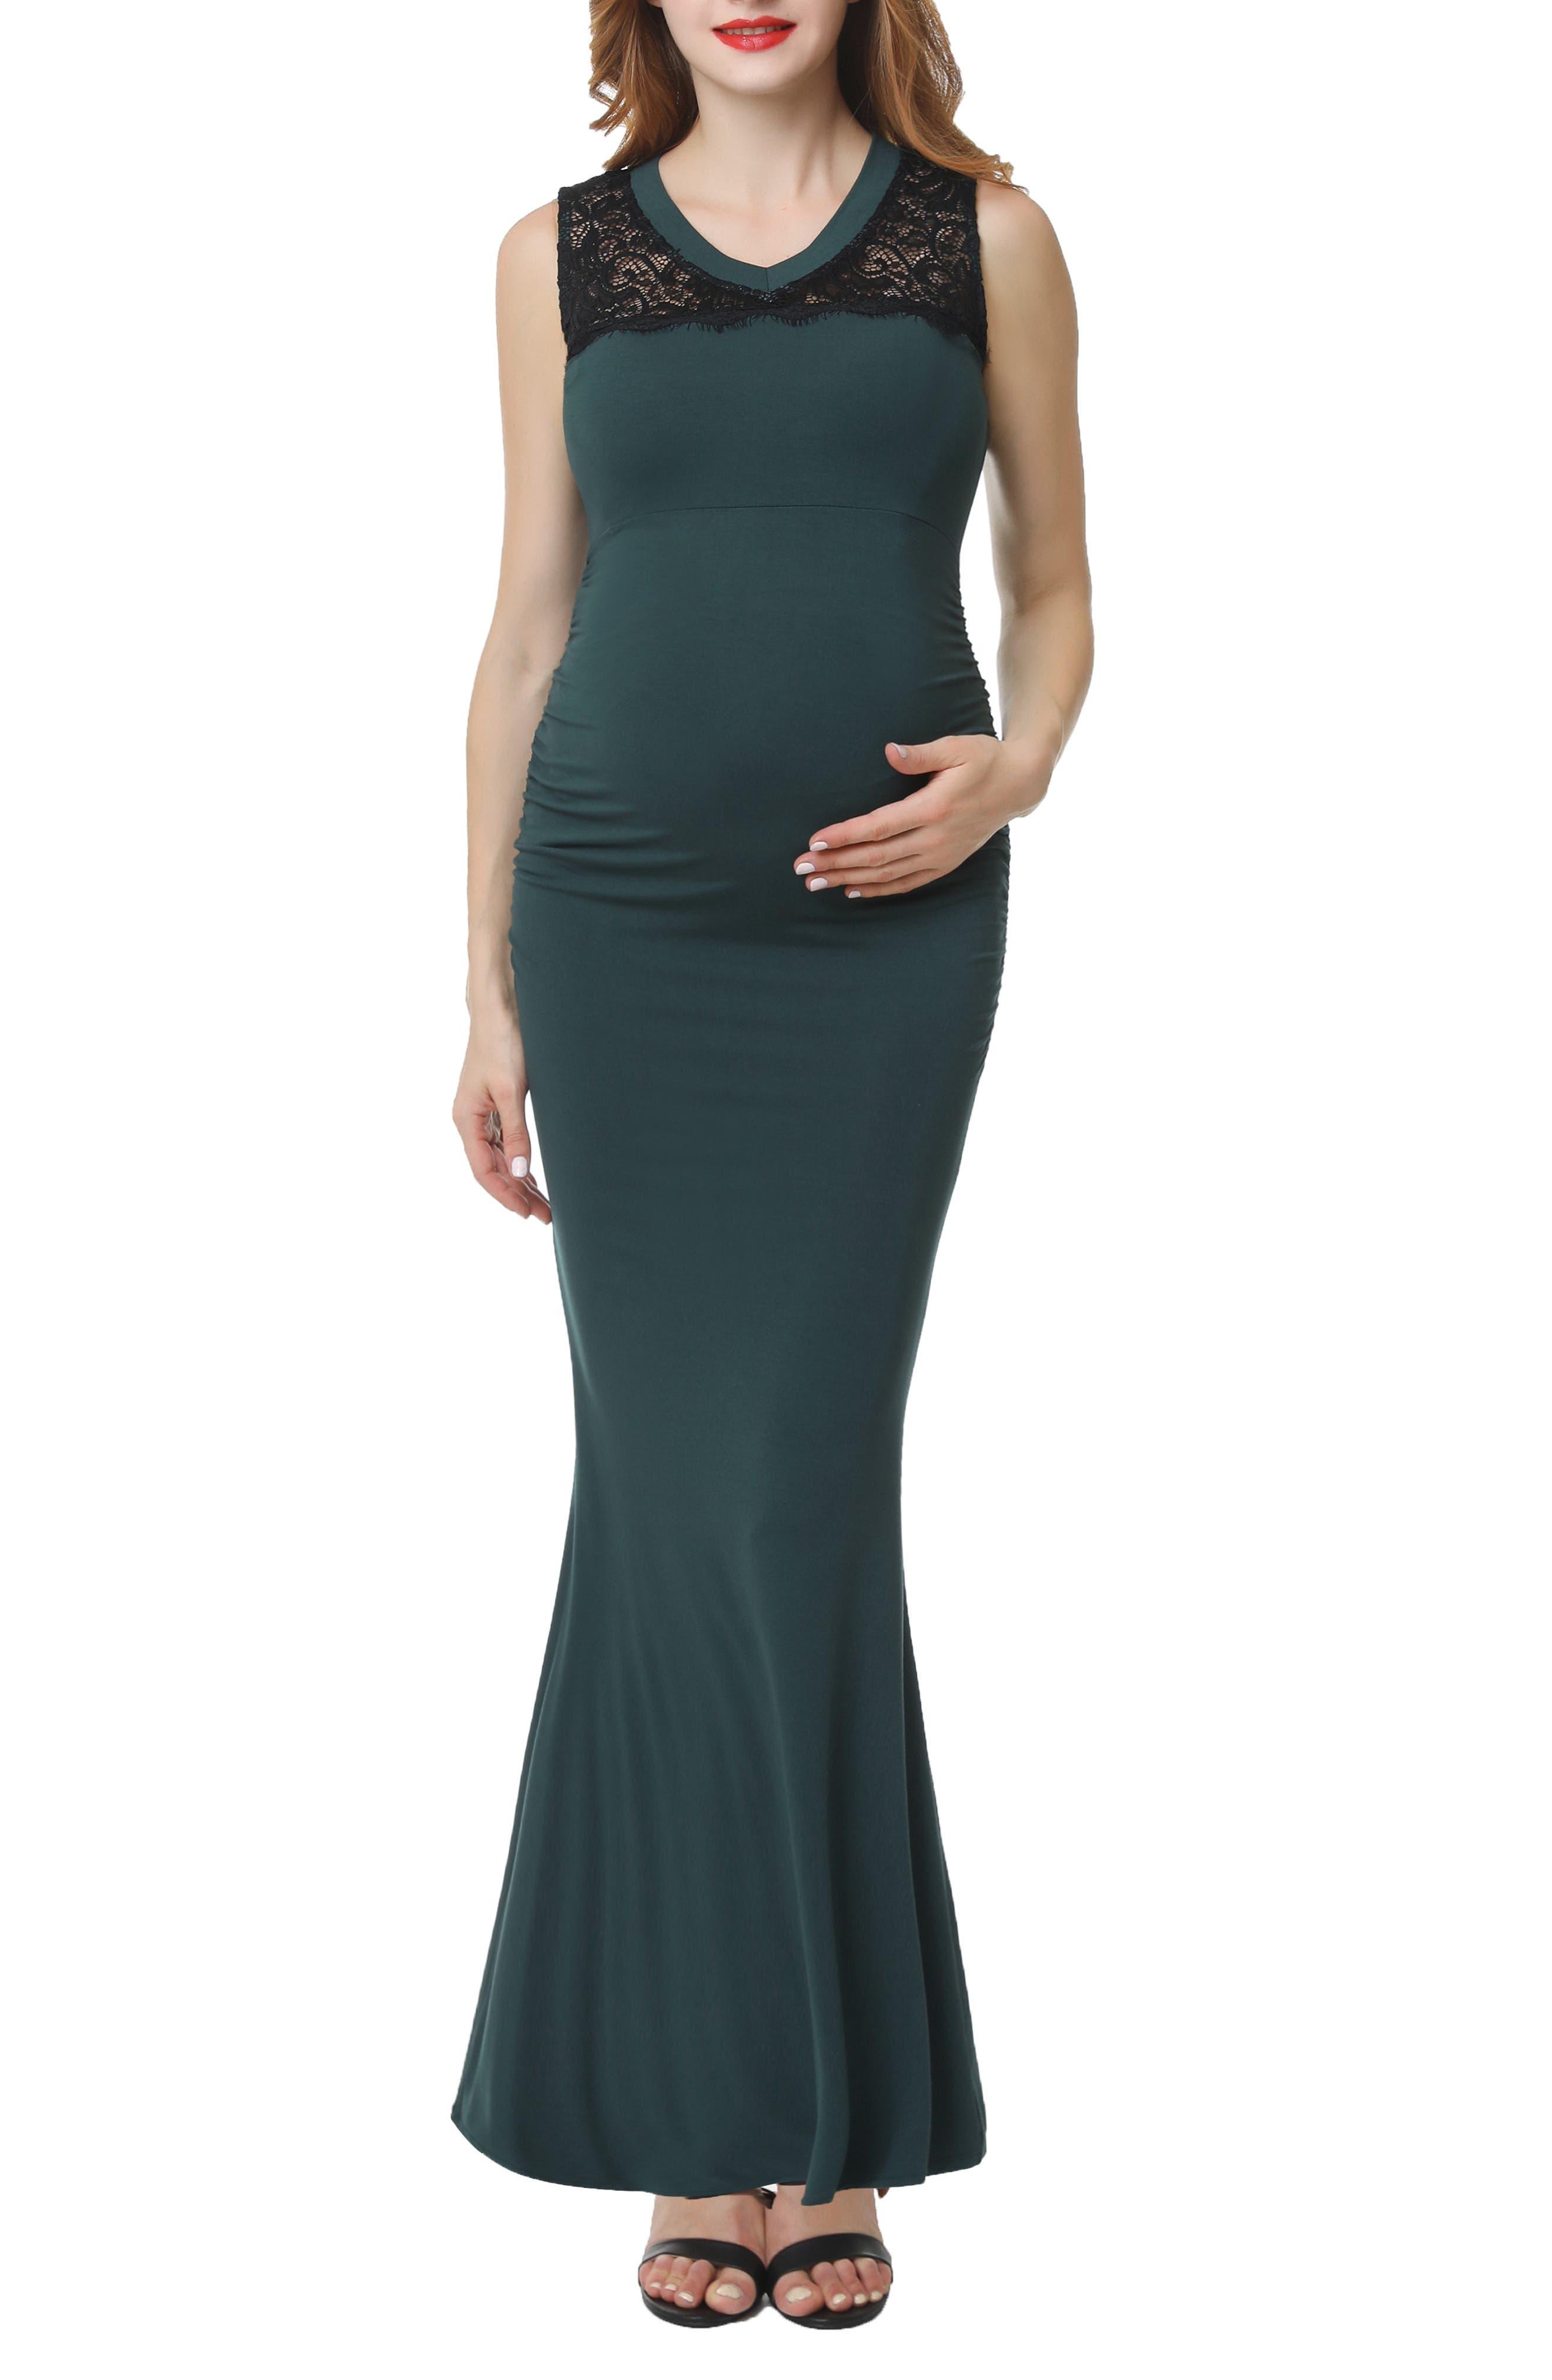 Kimi And Kai Tilda Maternity Mermaid Dress, Green